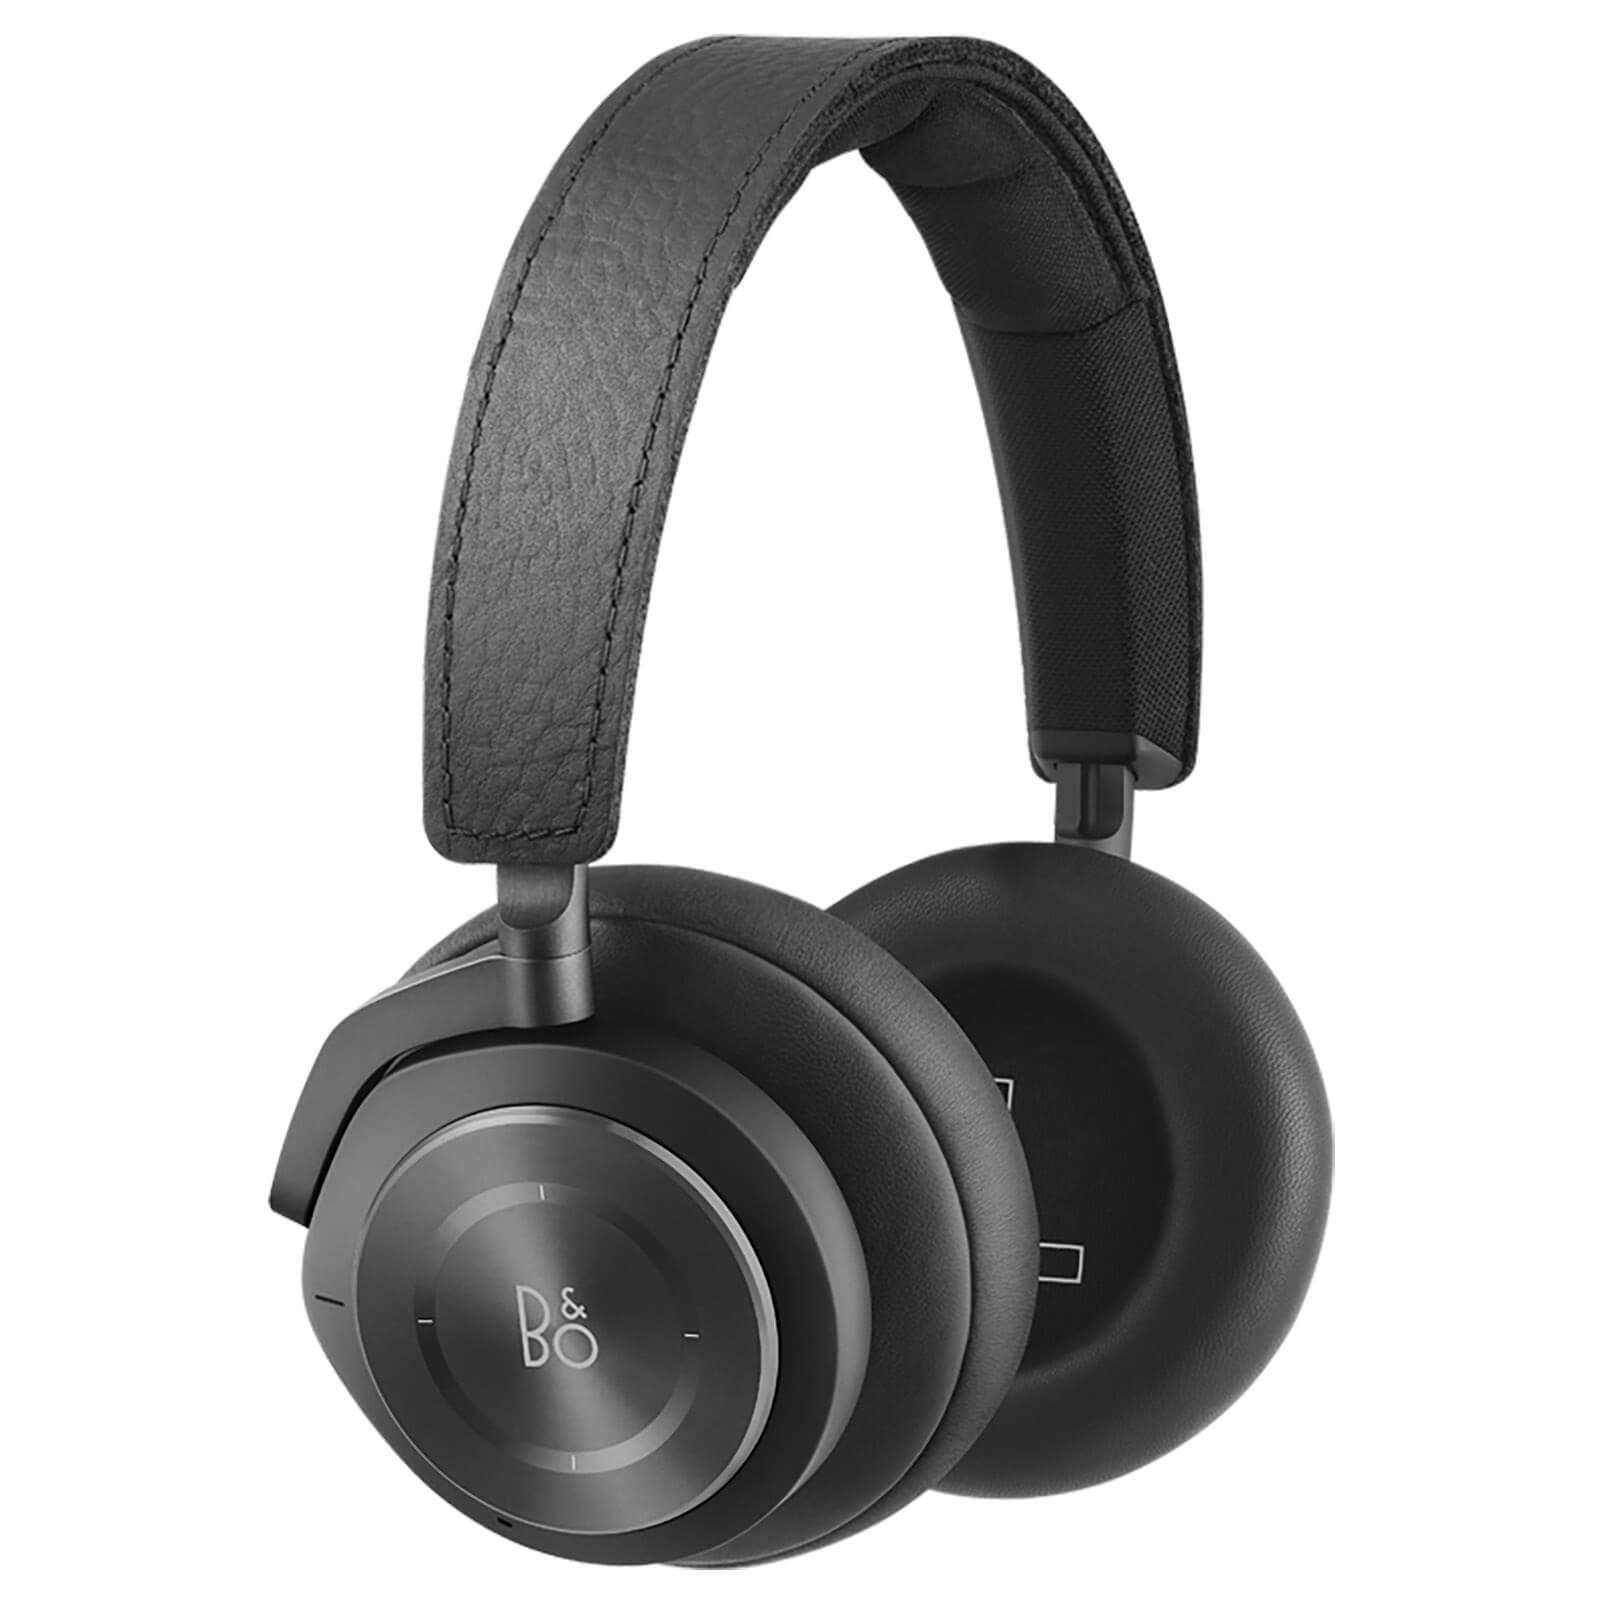 Bang & Olufsen H9 3.0 Over Ear Noise Cancelling Headphones - Matte Black